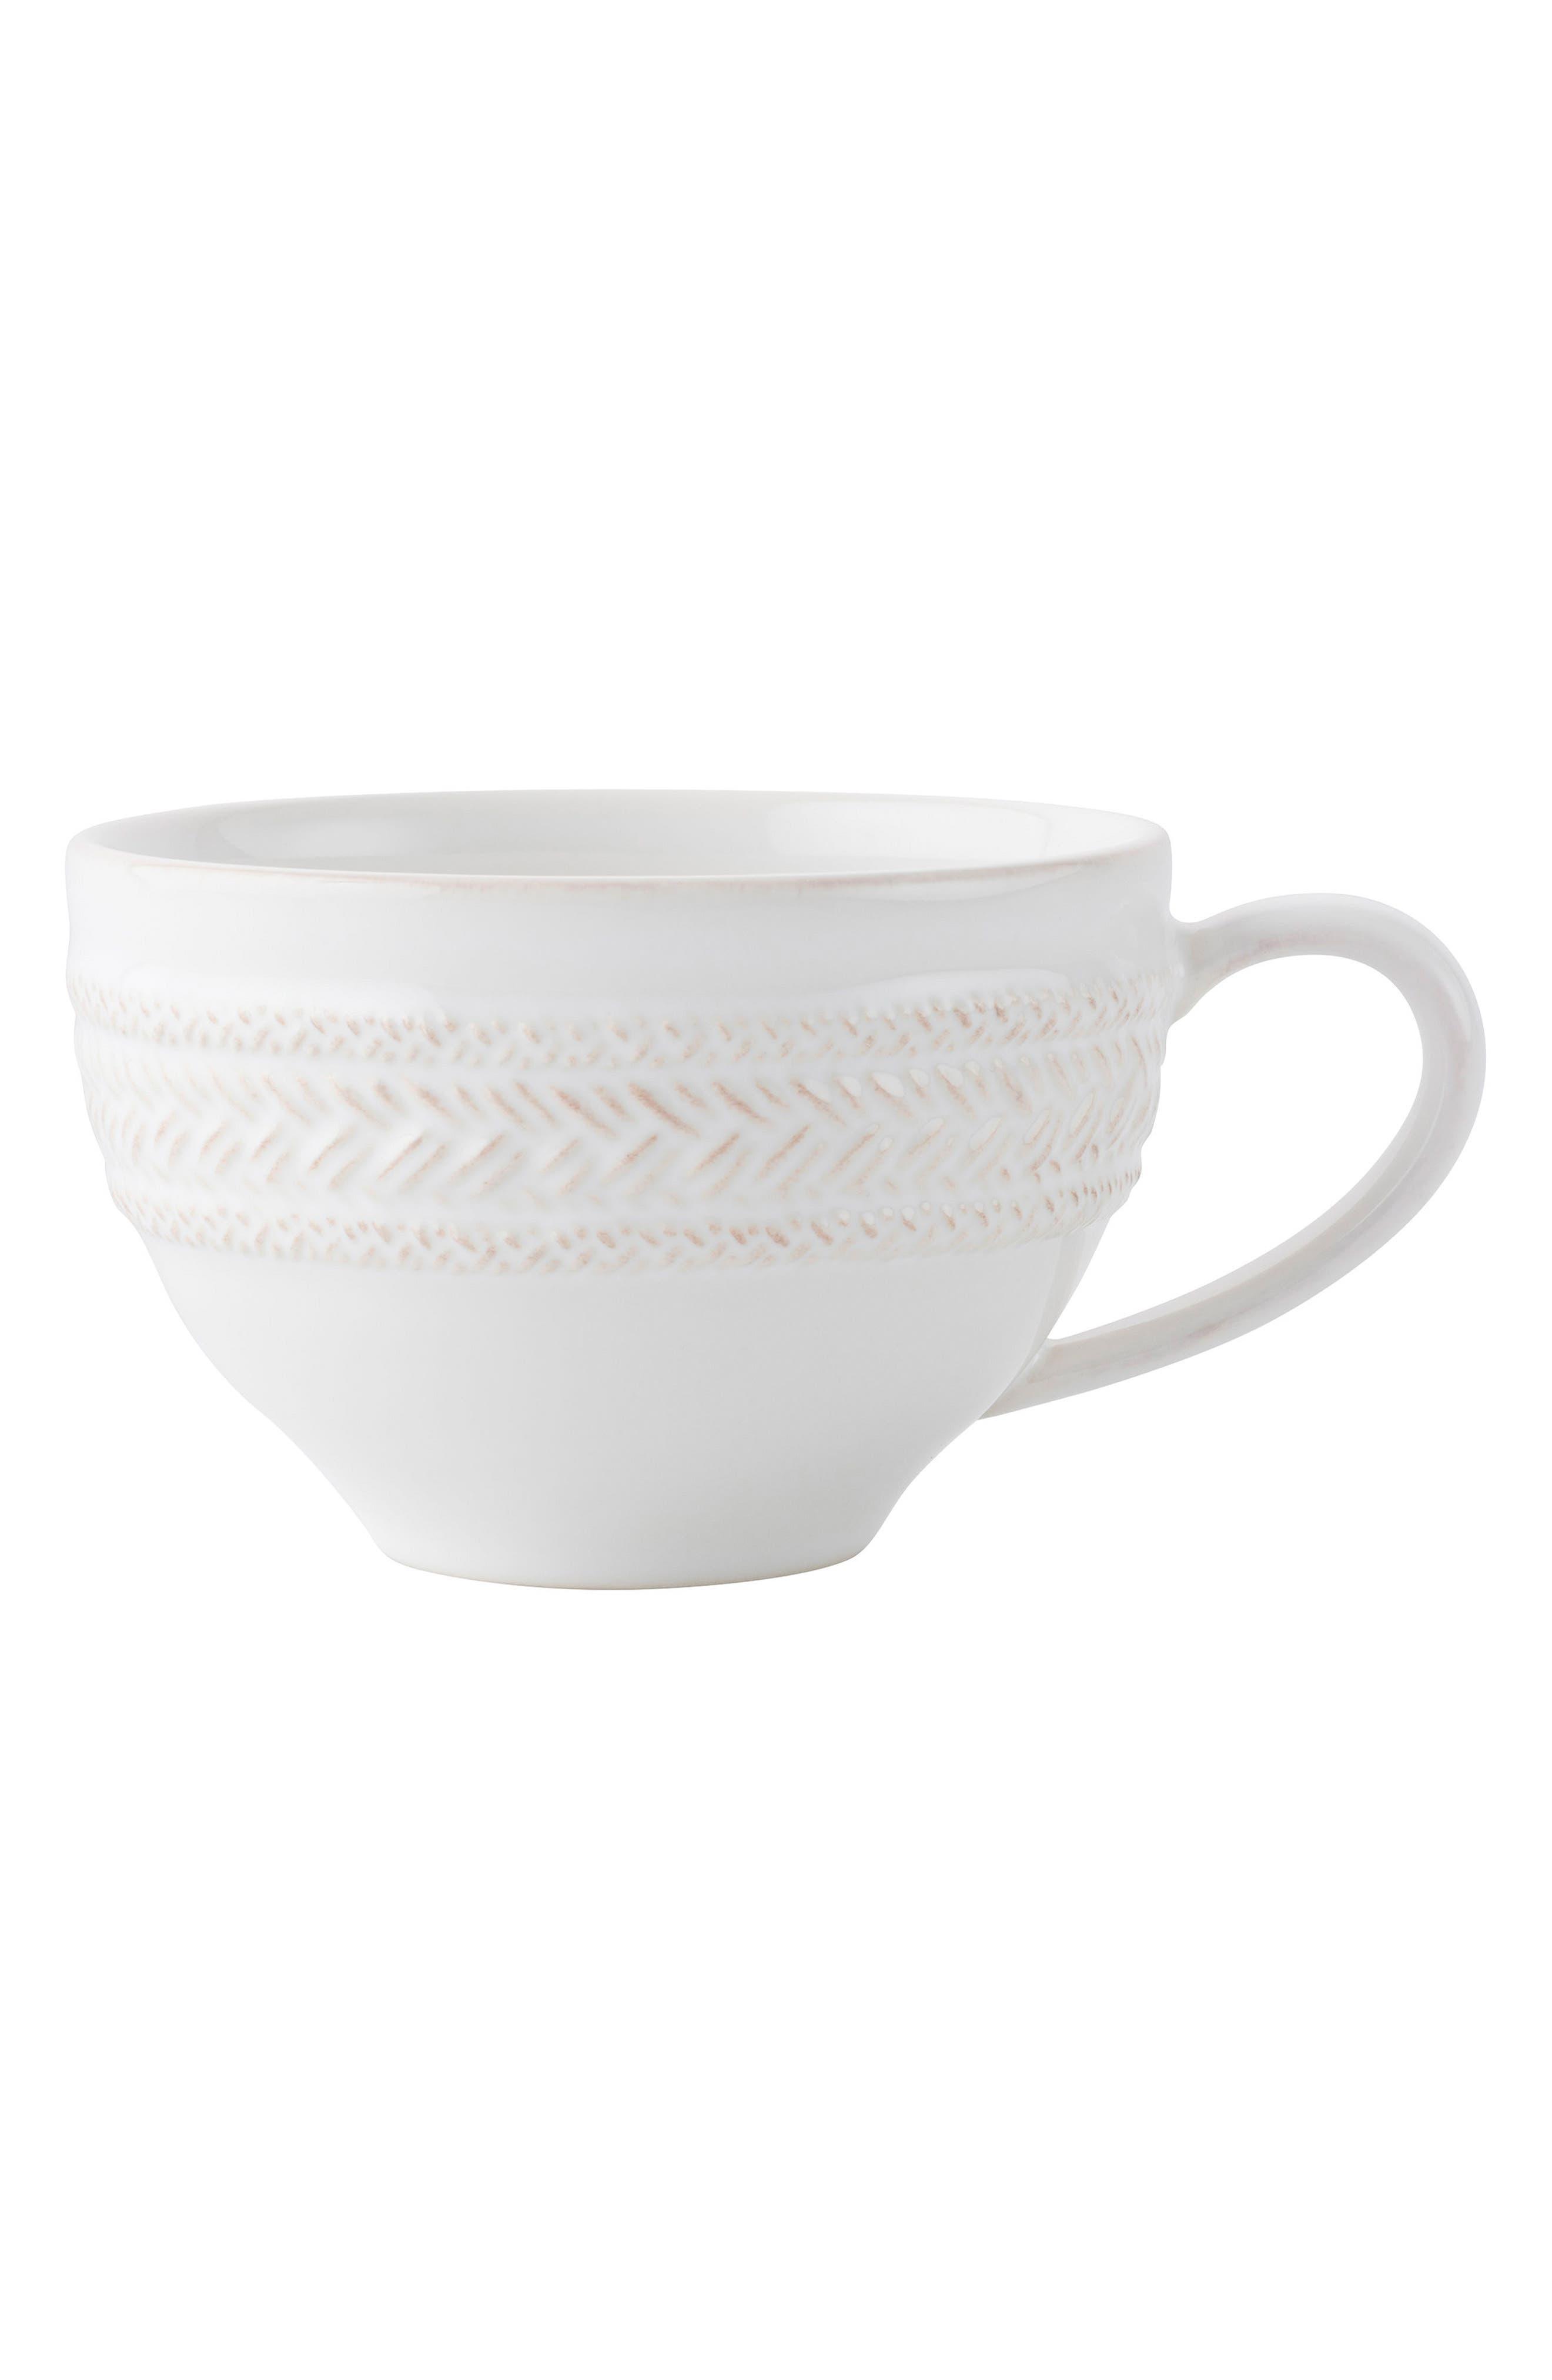 Le Panier Whitewash Coffee Cup,                         Main,                         color, Whitewash